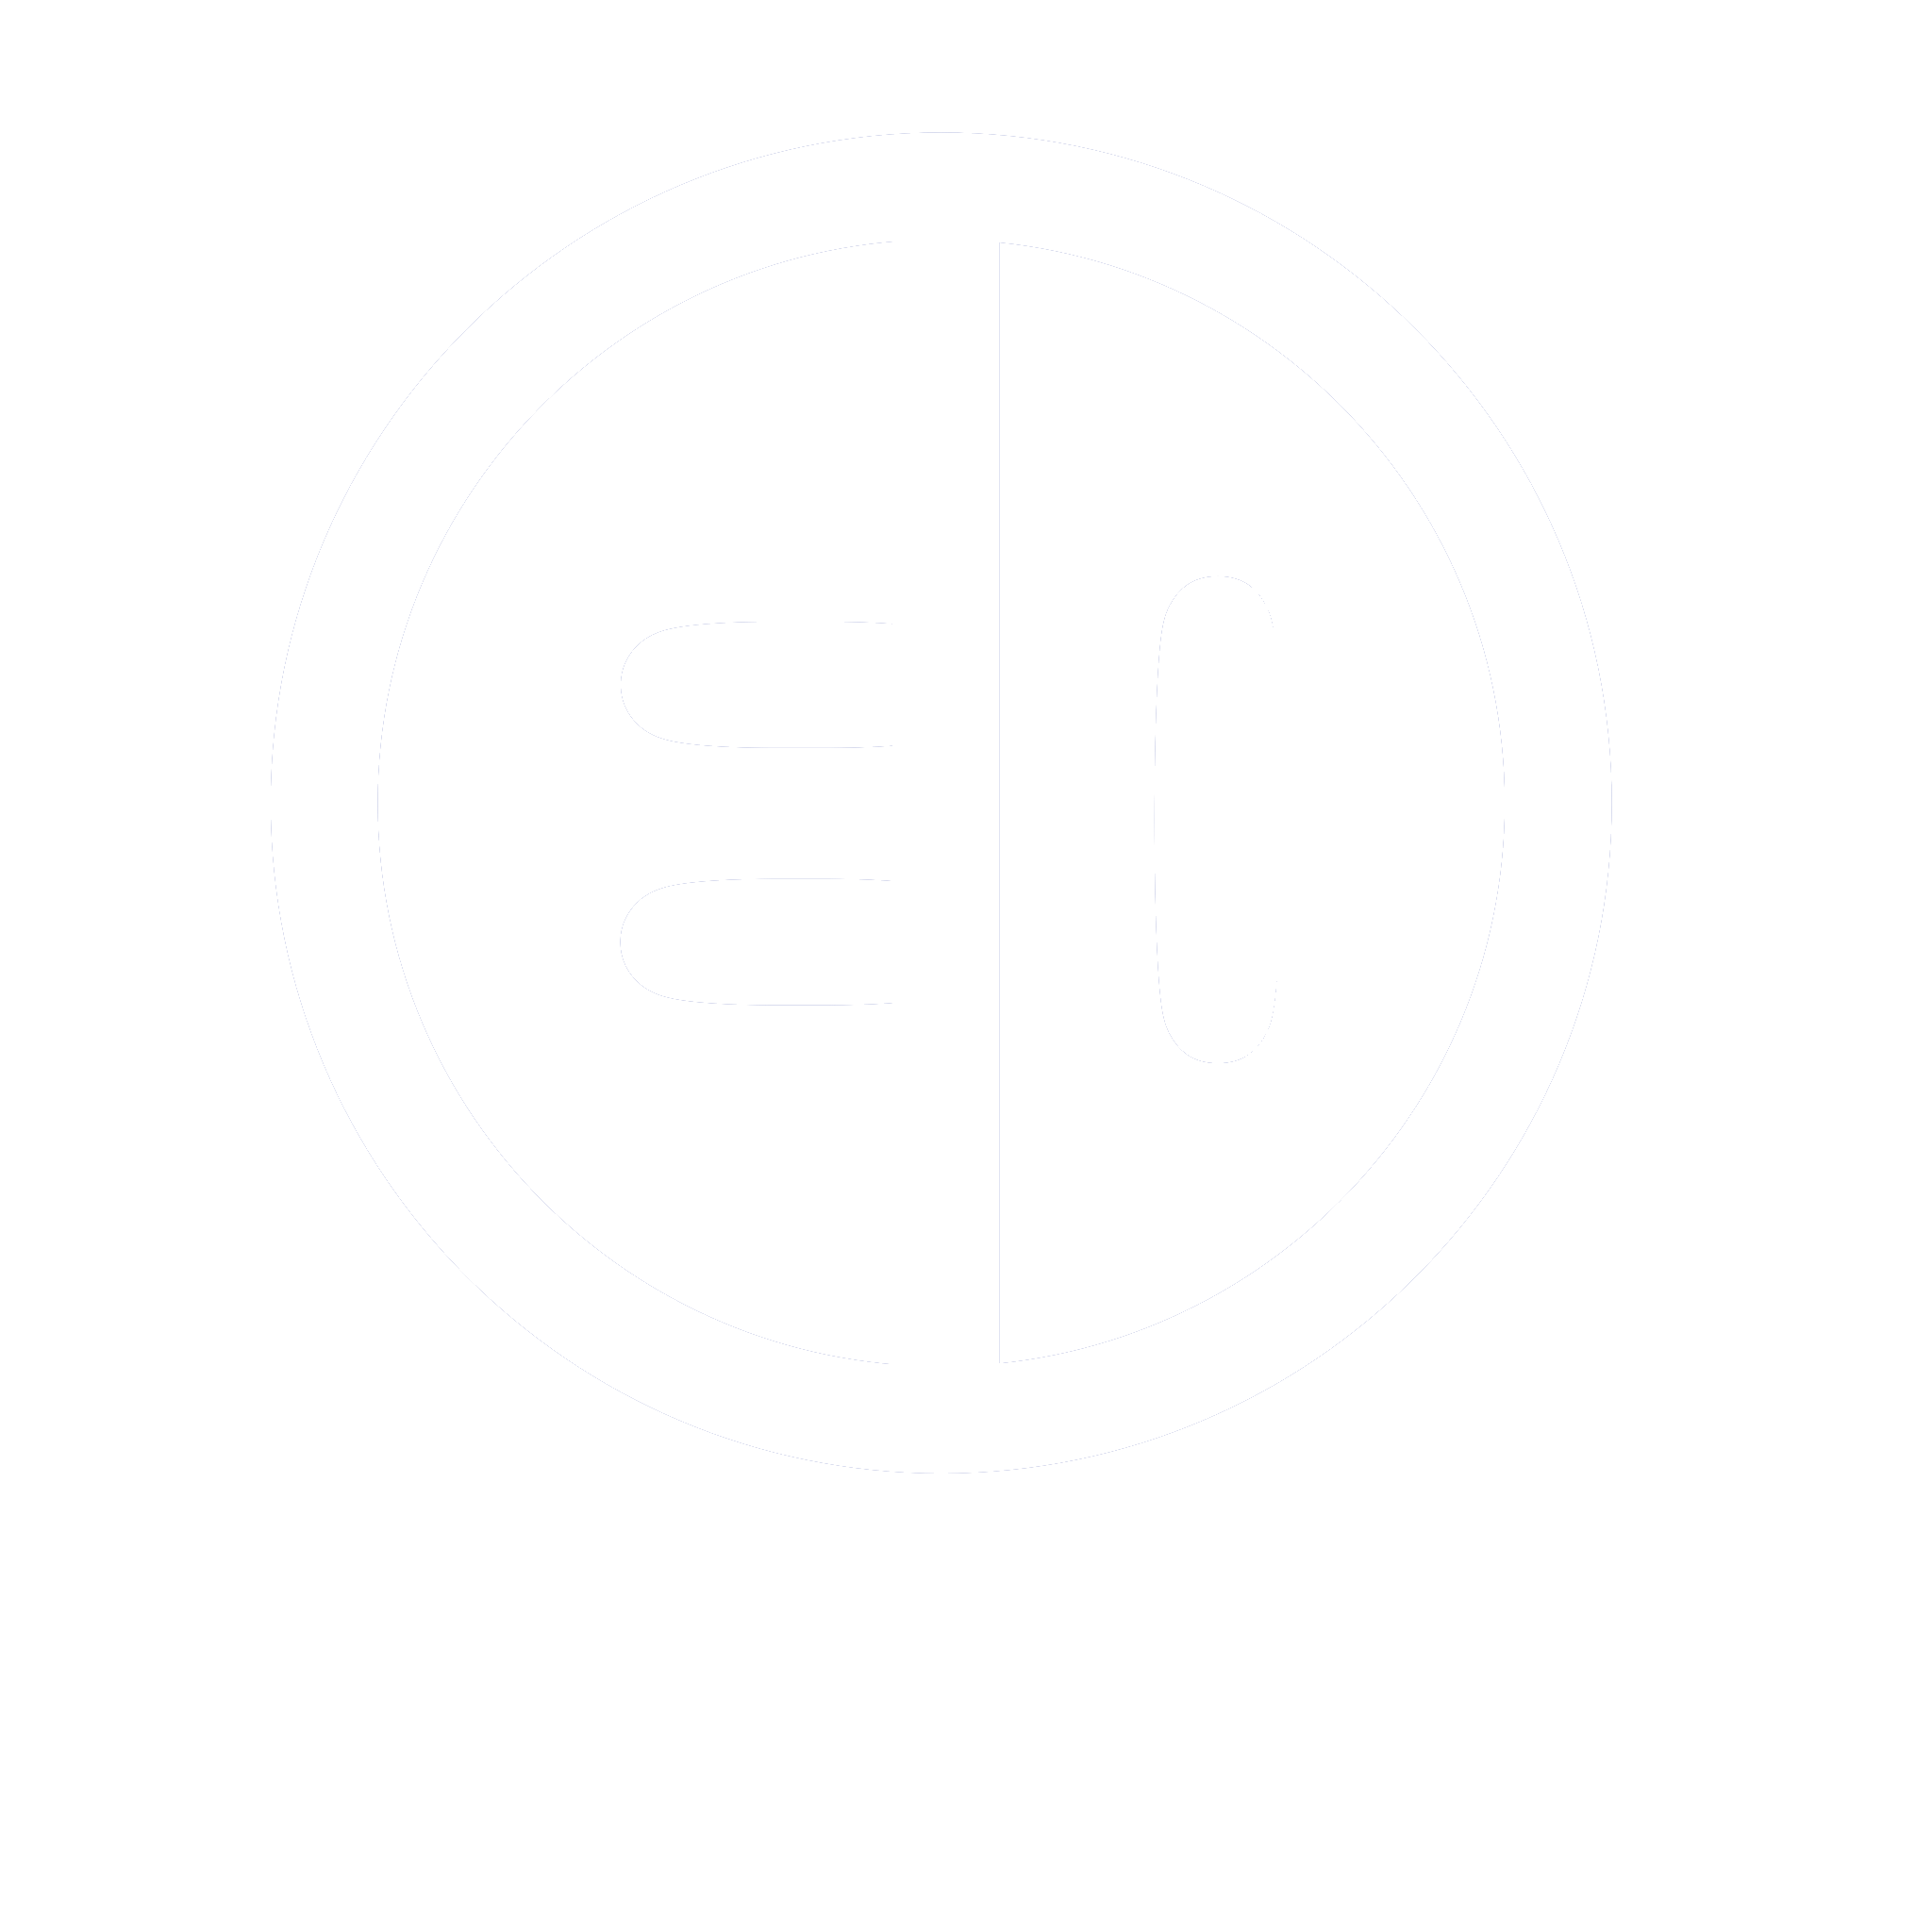 Edmoxie